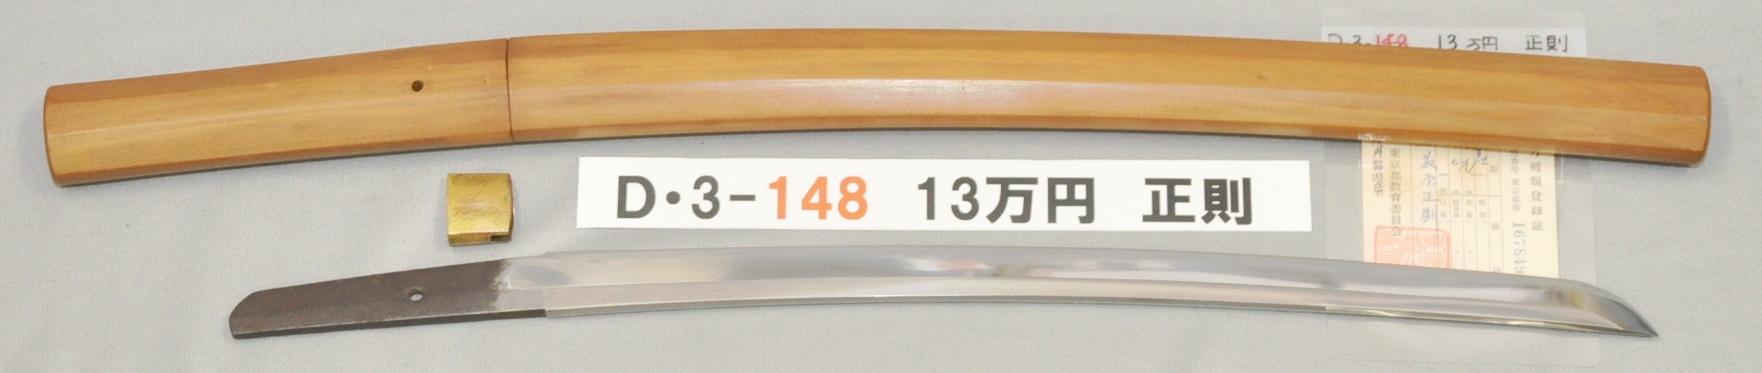 D3148